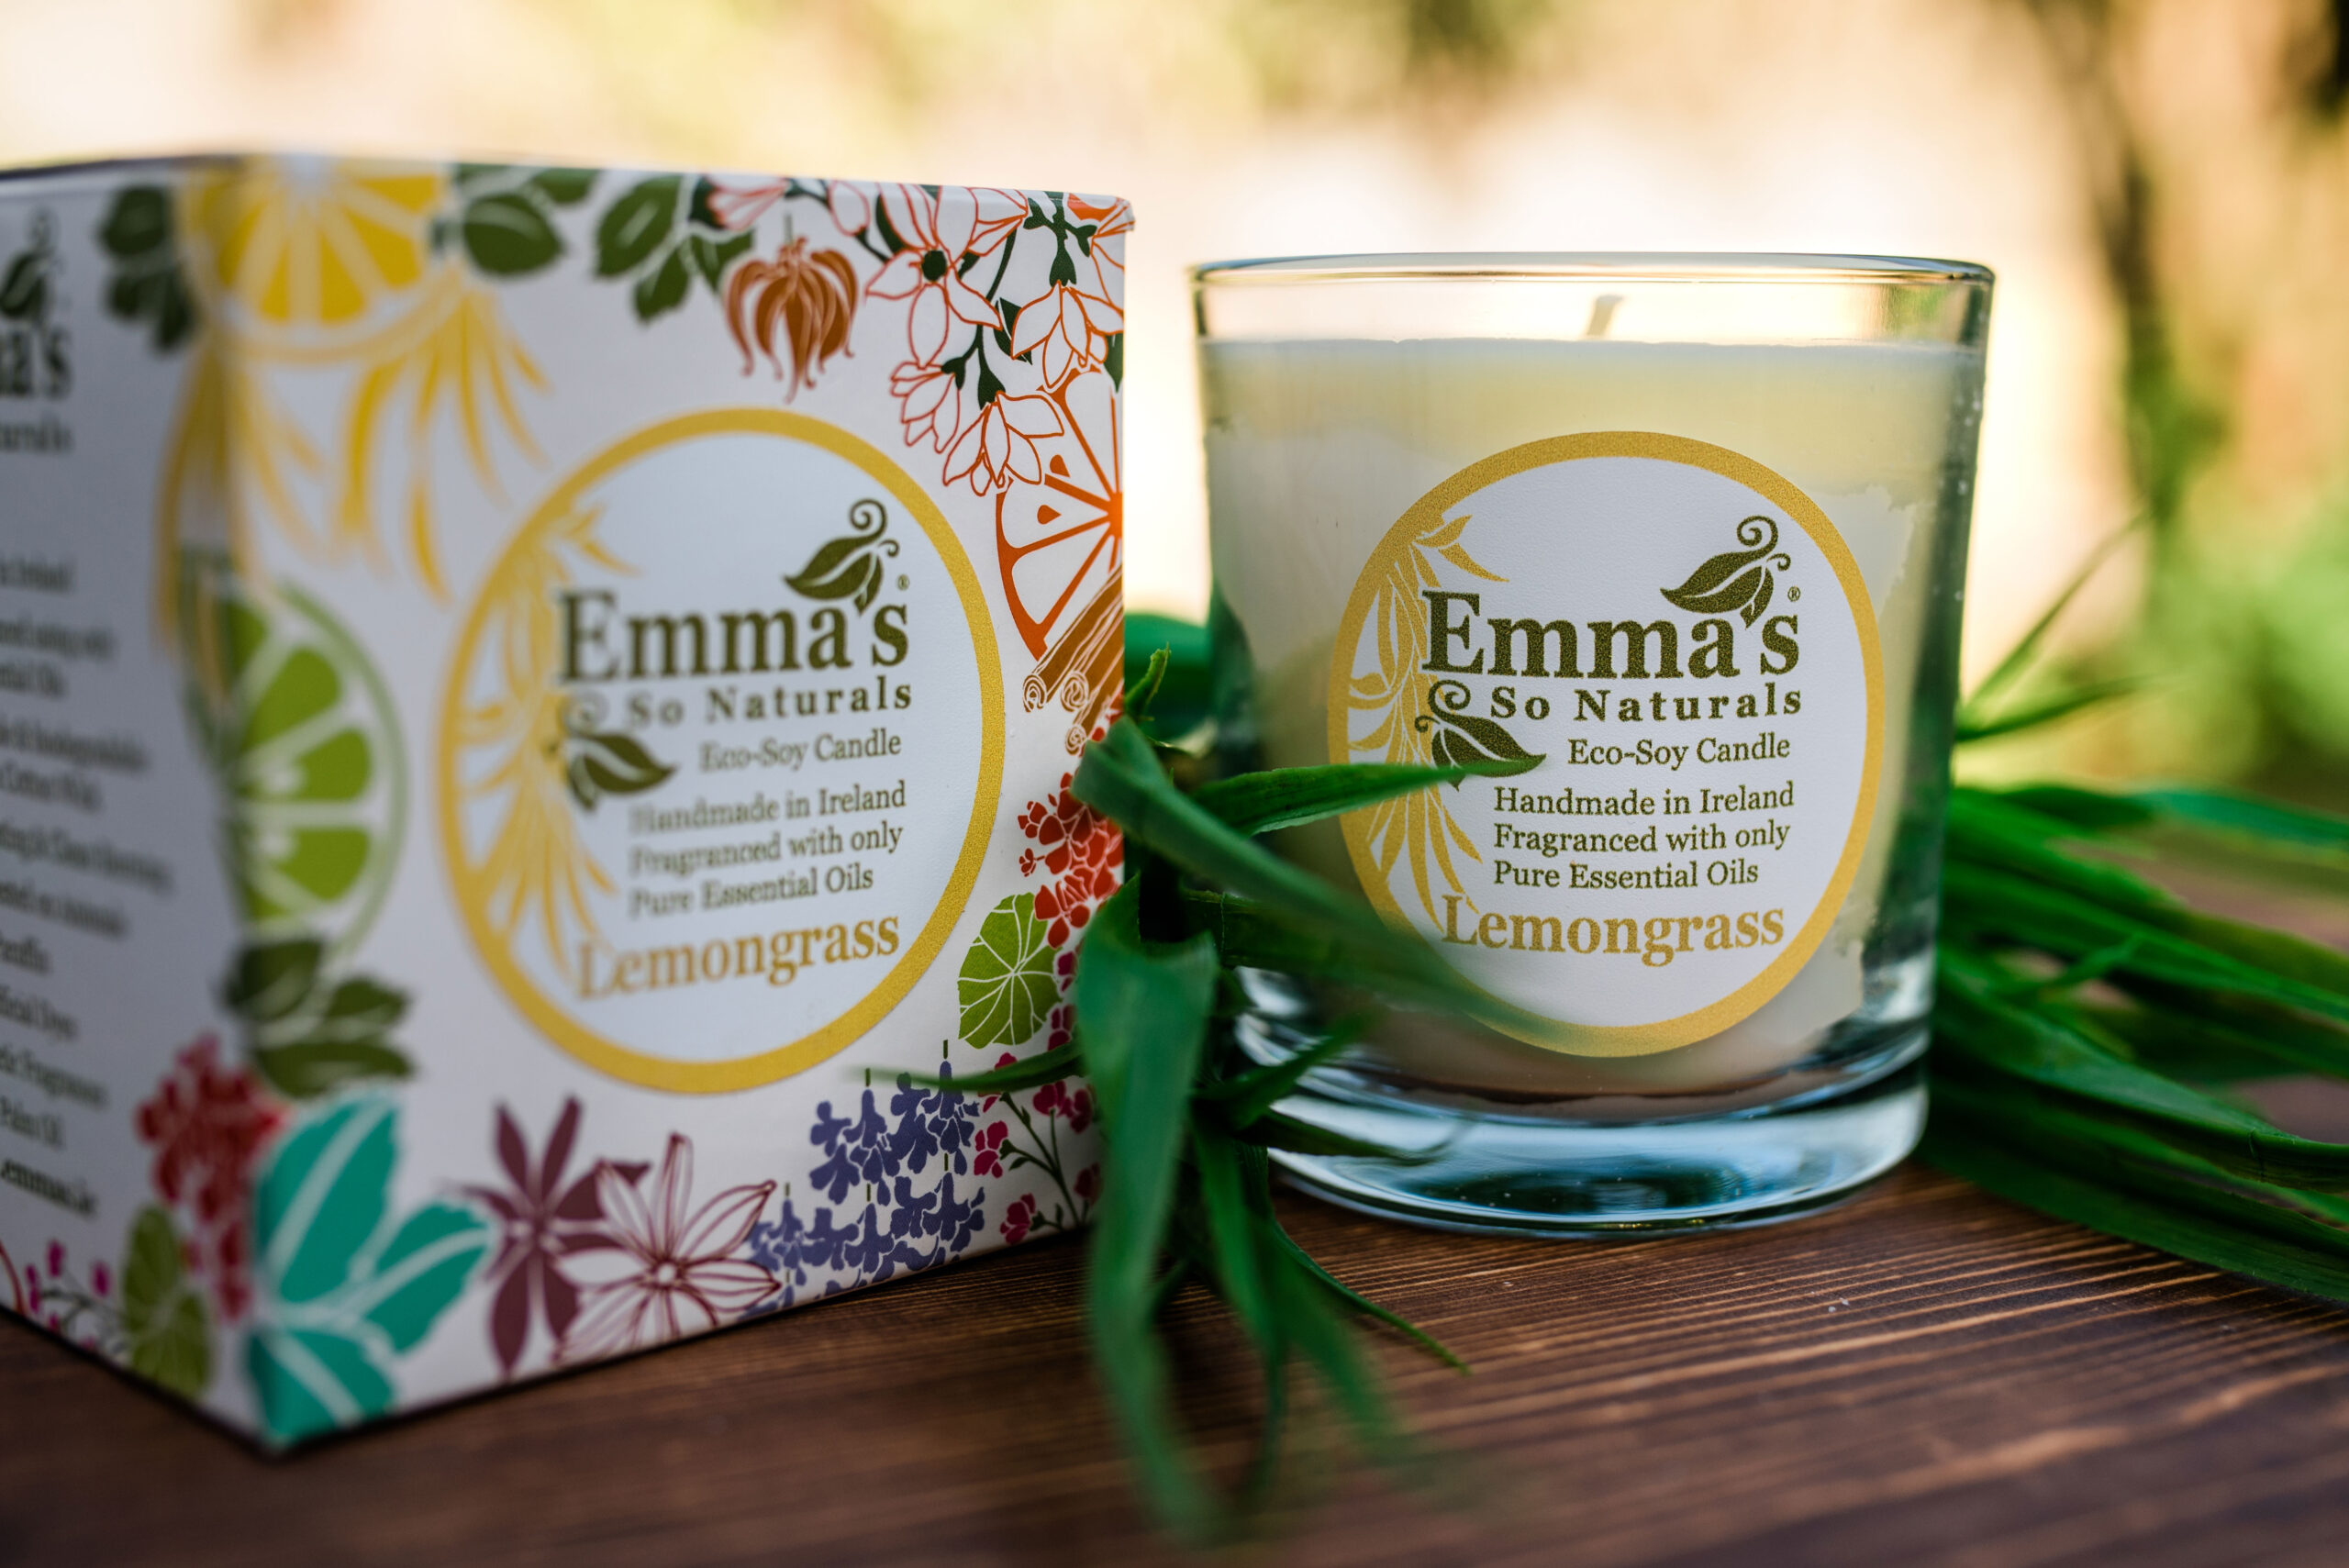 Emma's_So_Naturals_Lemongrass_Tumbler_Candle_&_Box